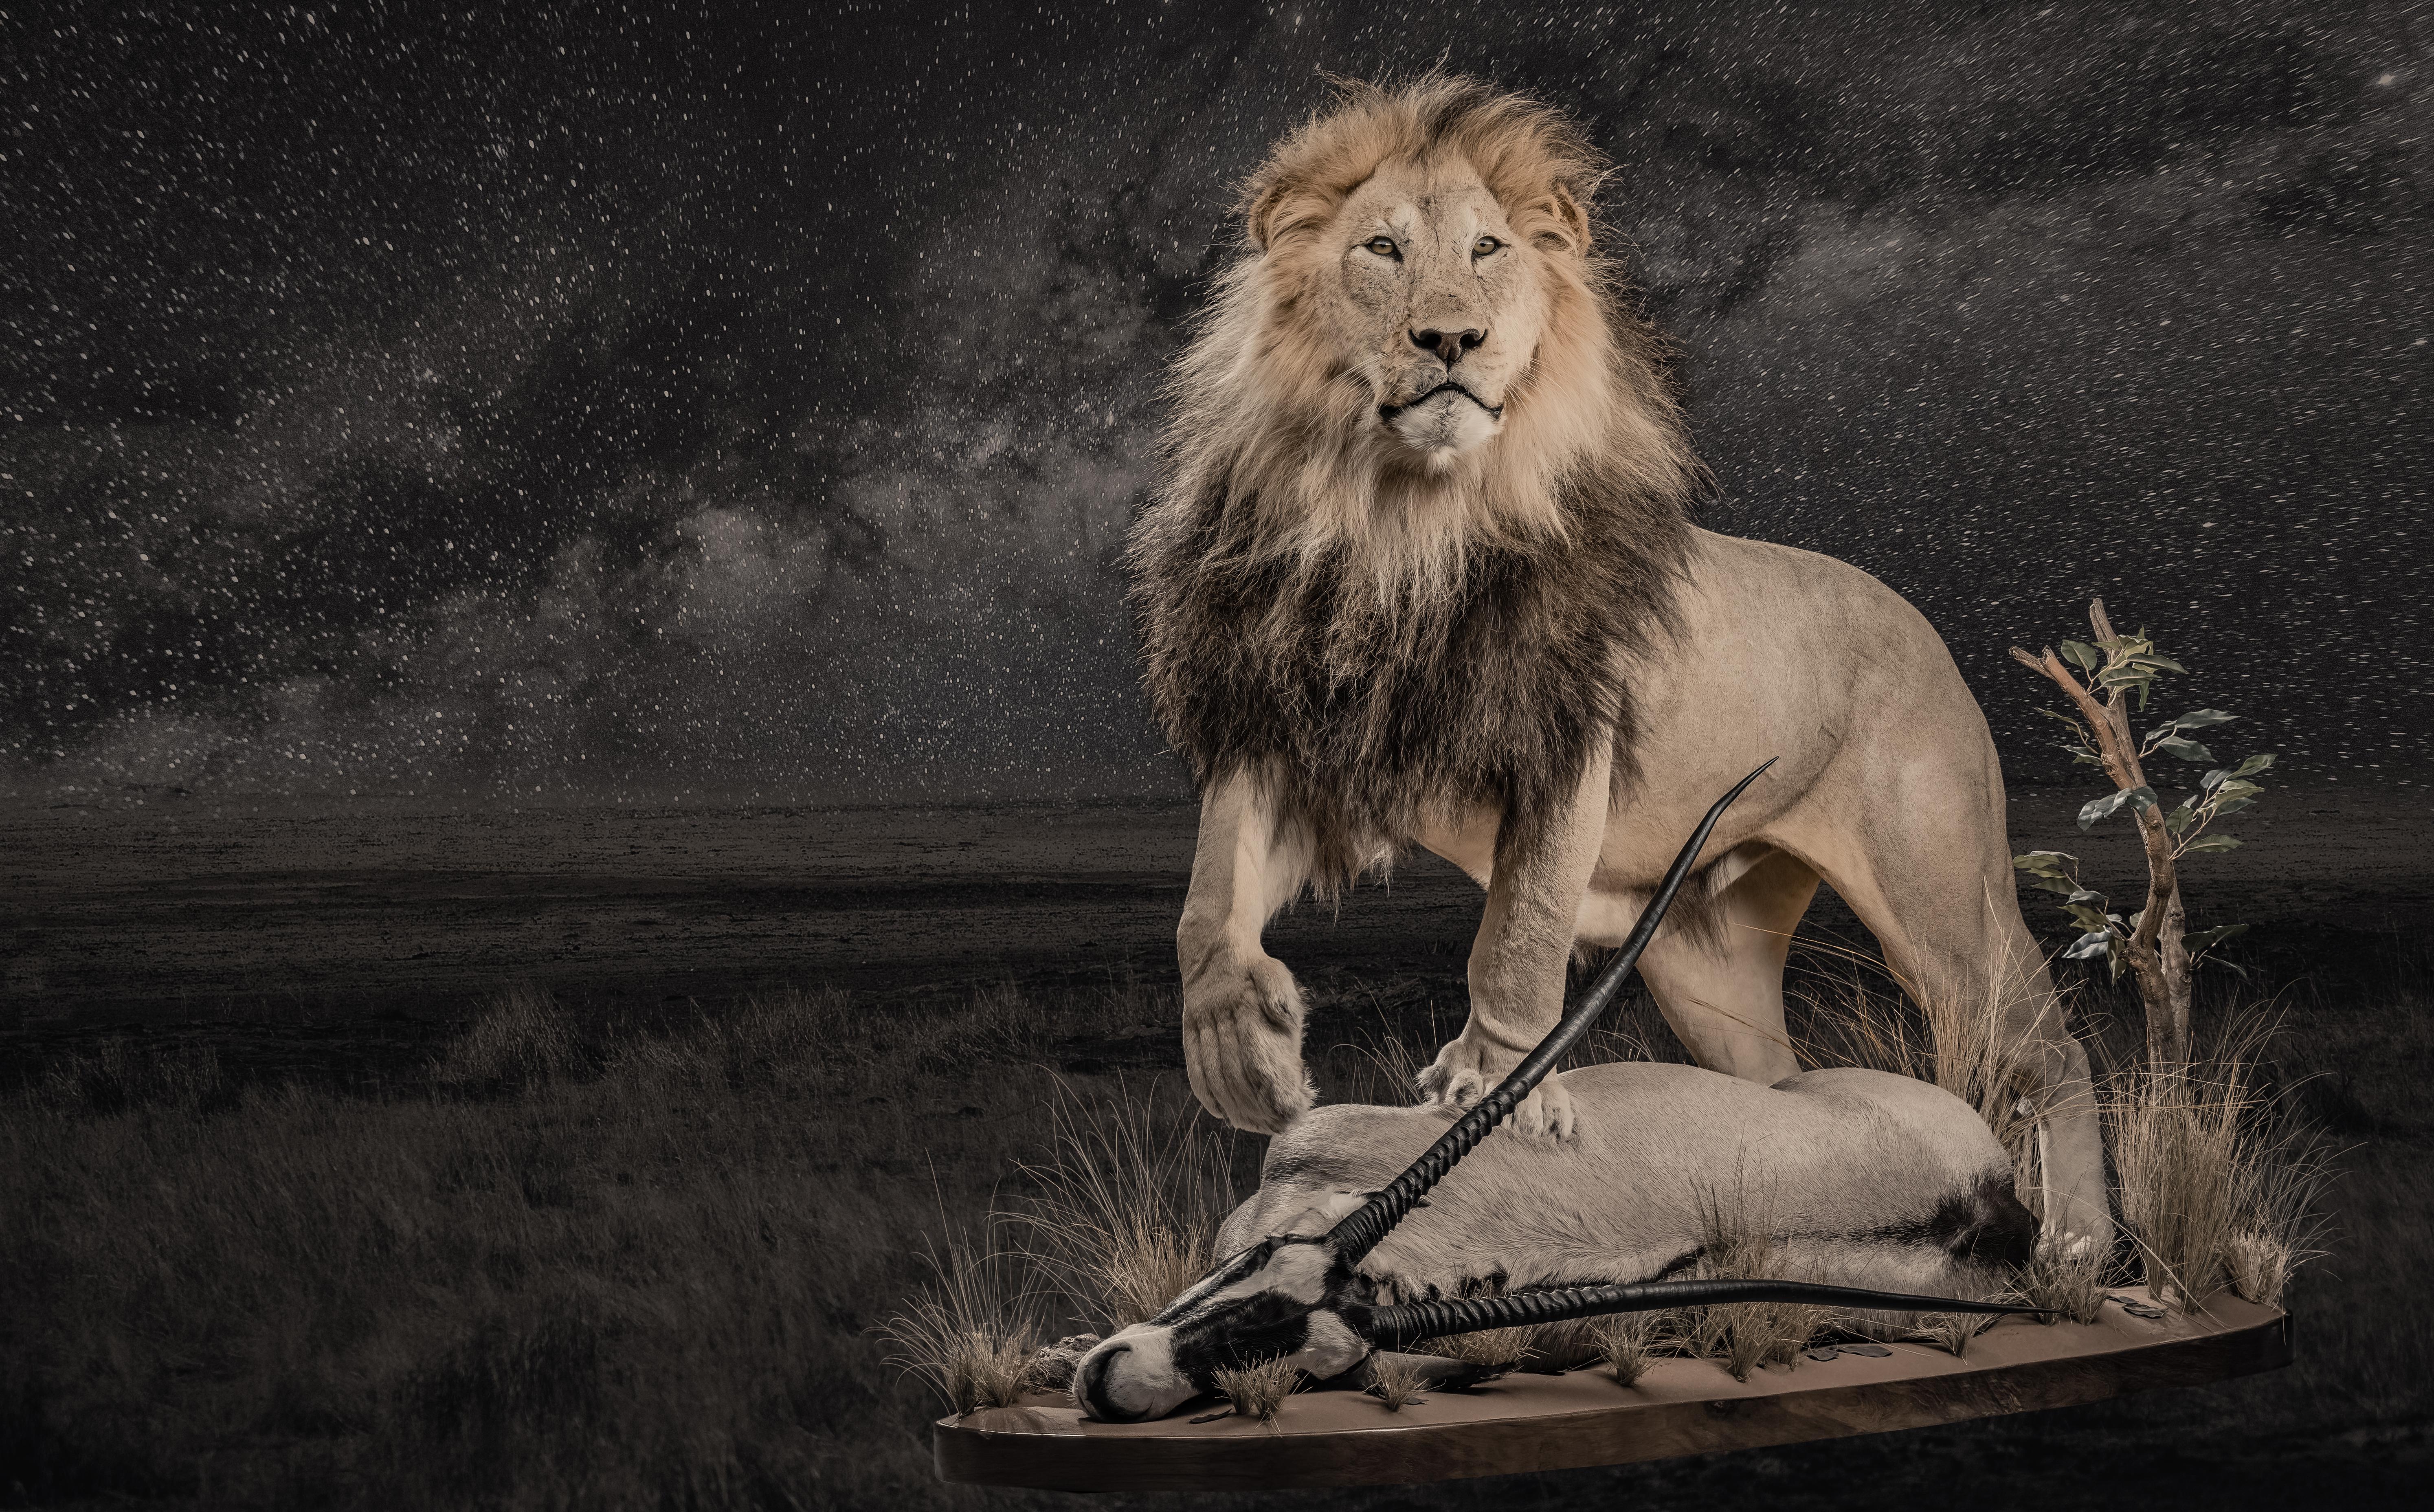 lion-and-gemsbuck-combination-mount-hh133-1_2-jpg.418023